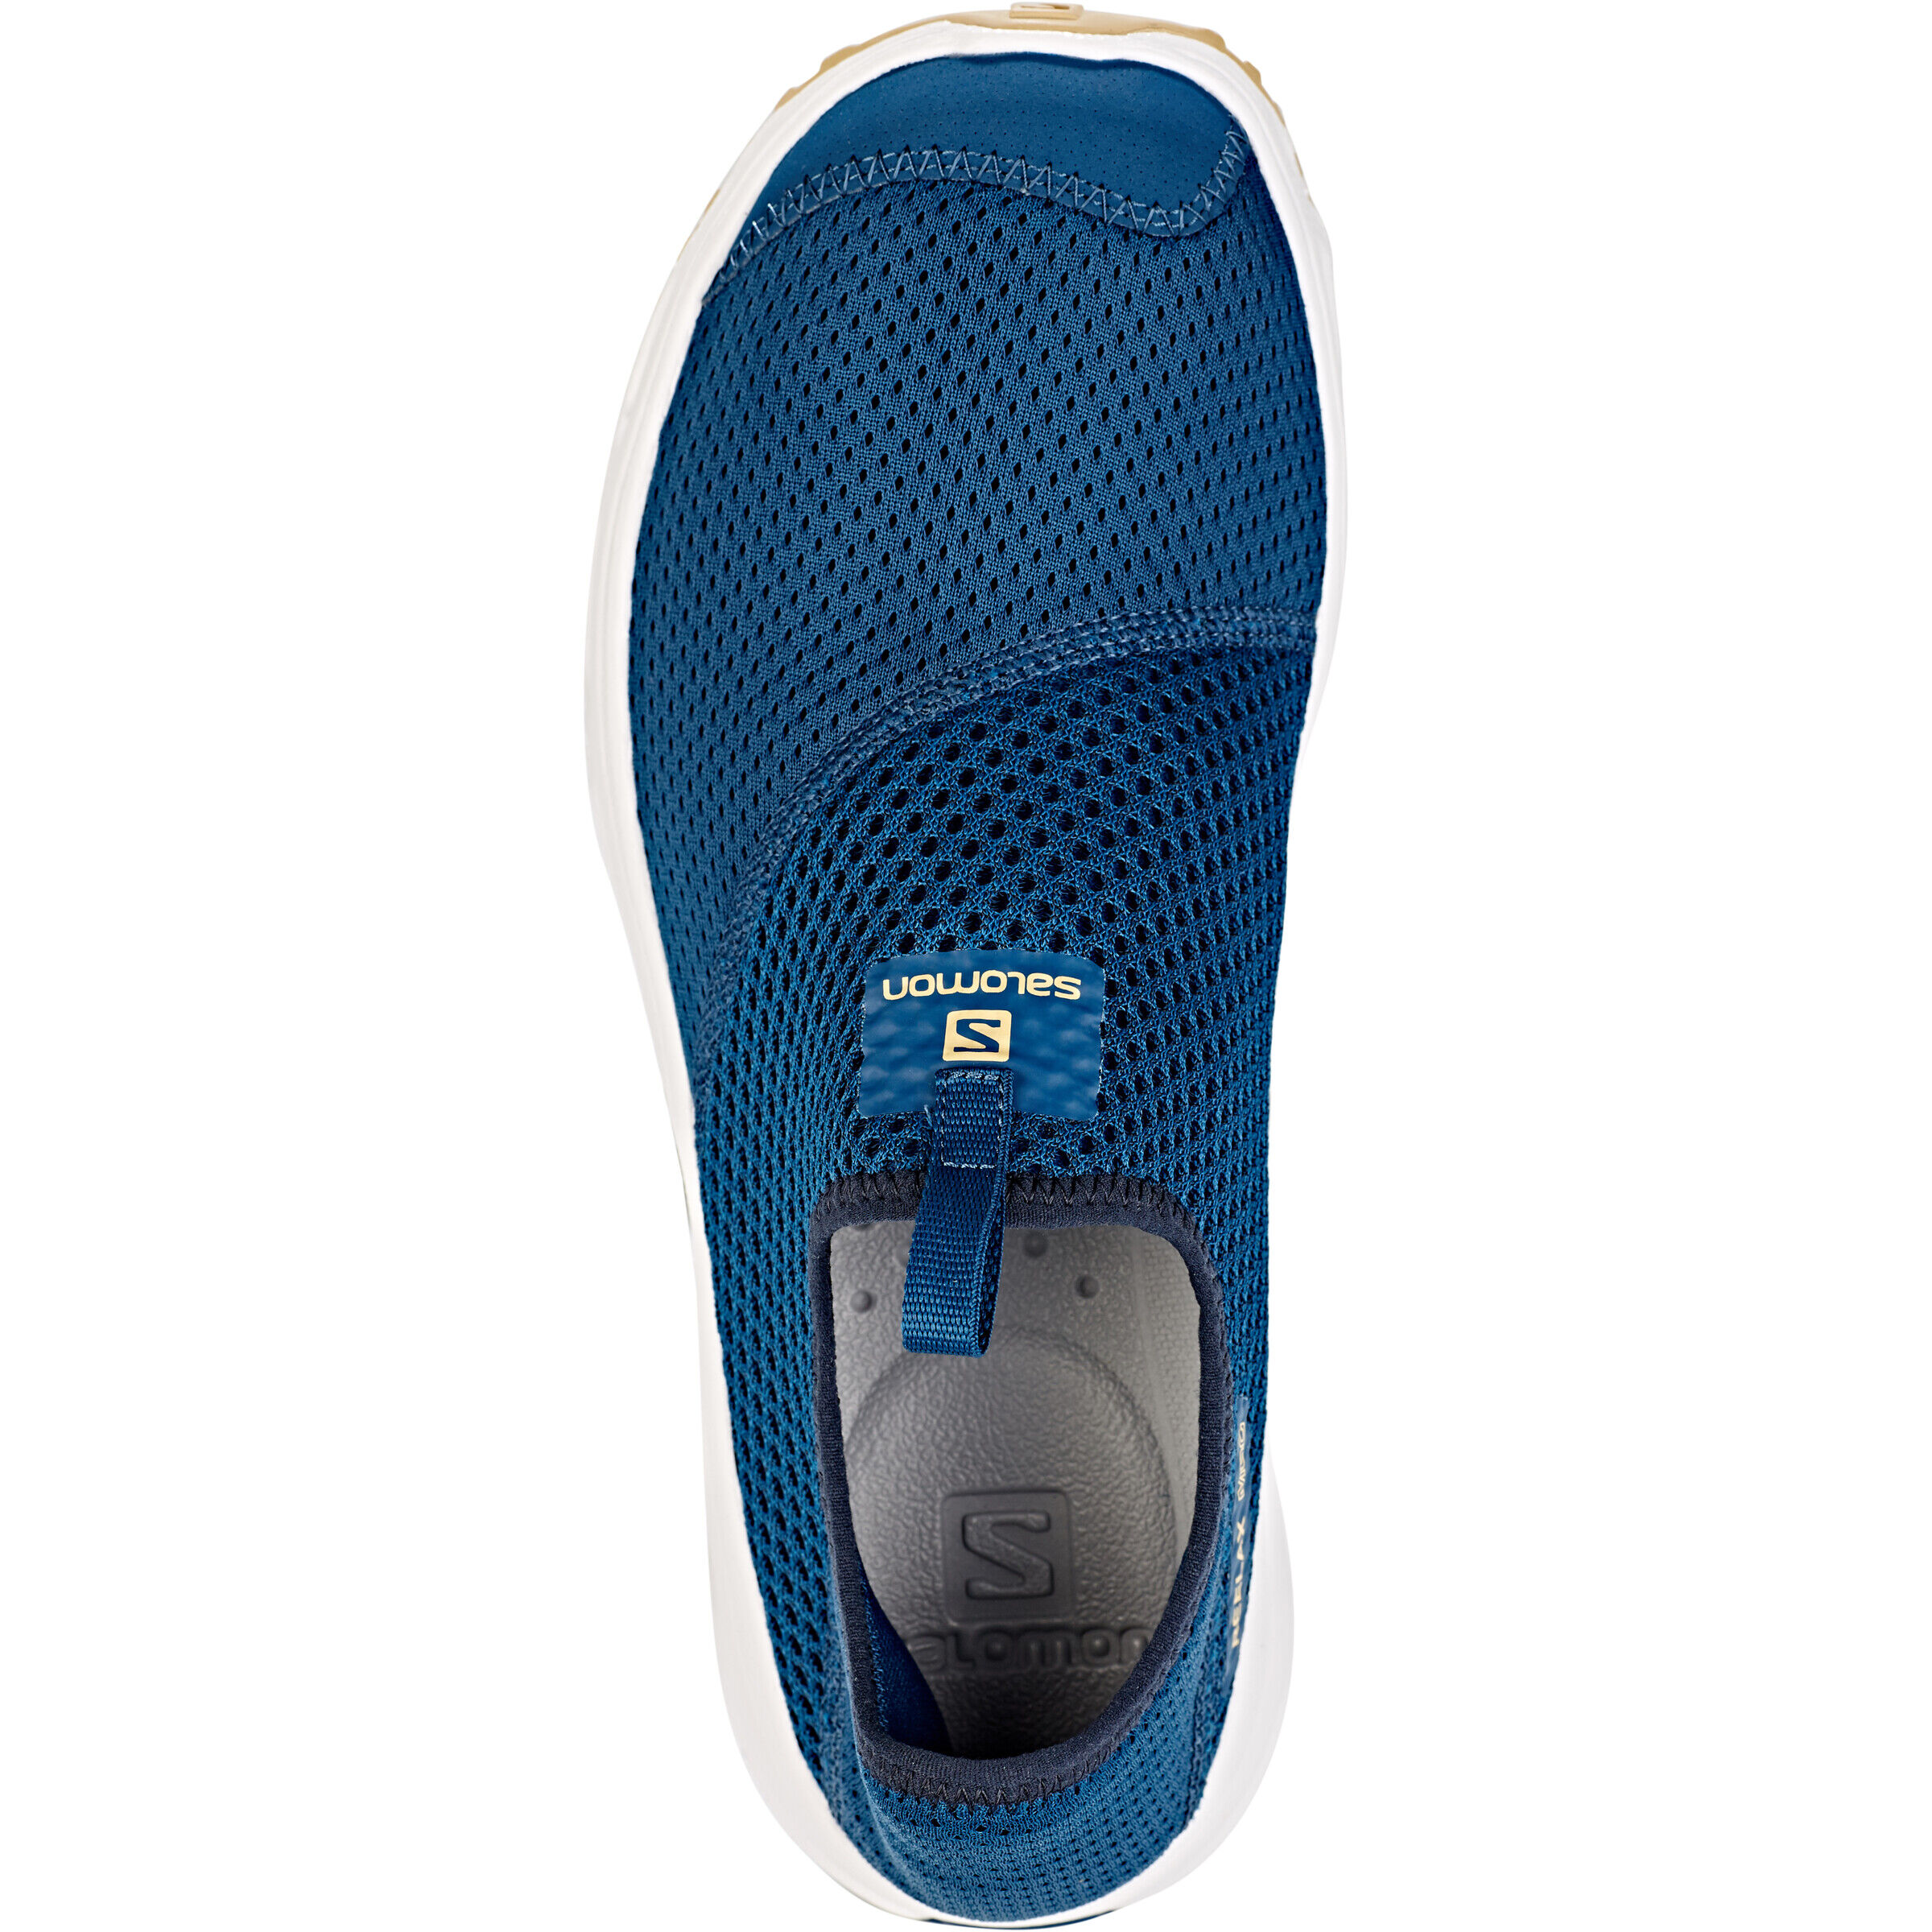 Salomon RX Moc 4.0 Schuhe Herren poseidonwhitetaos taupe